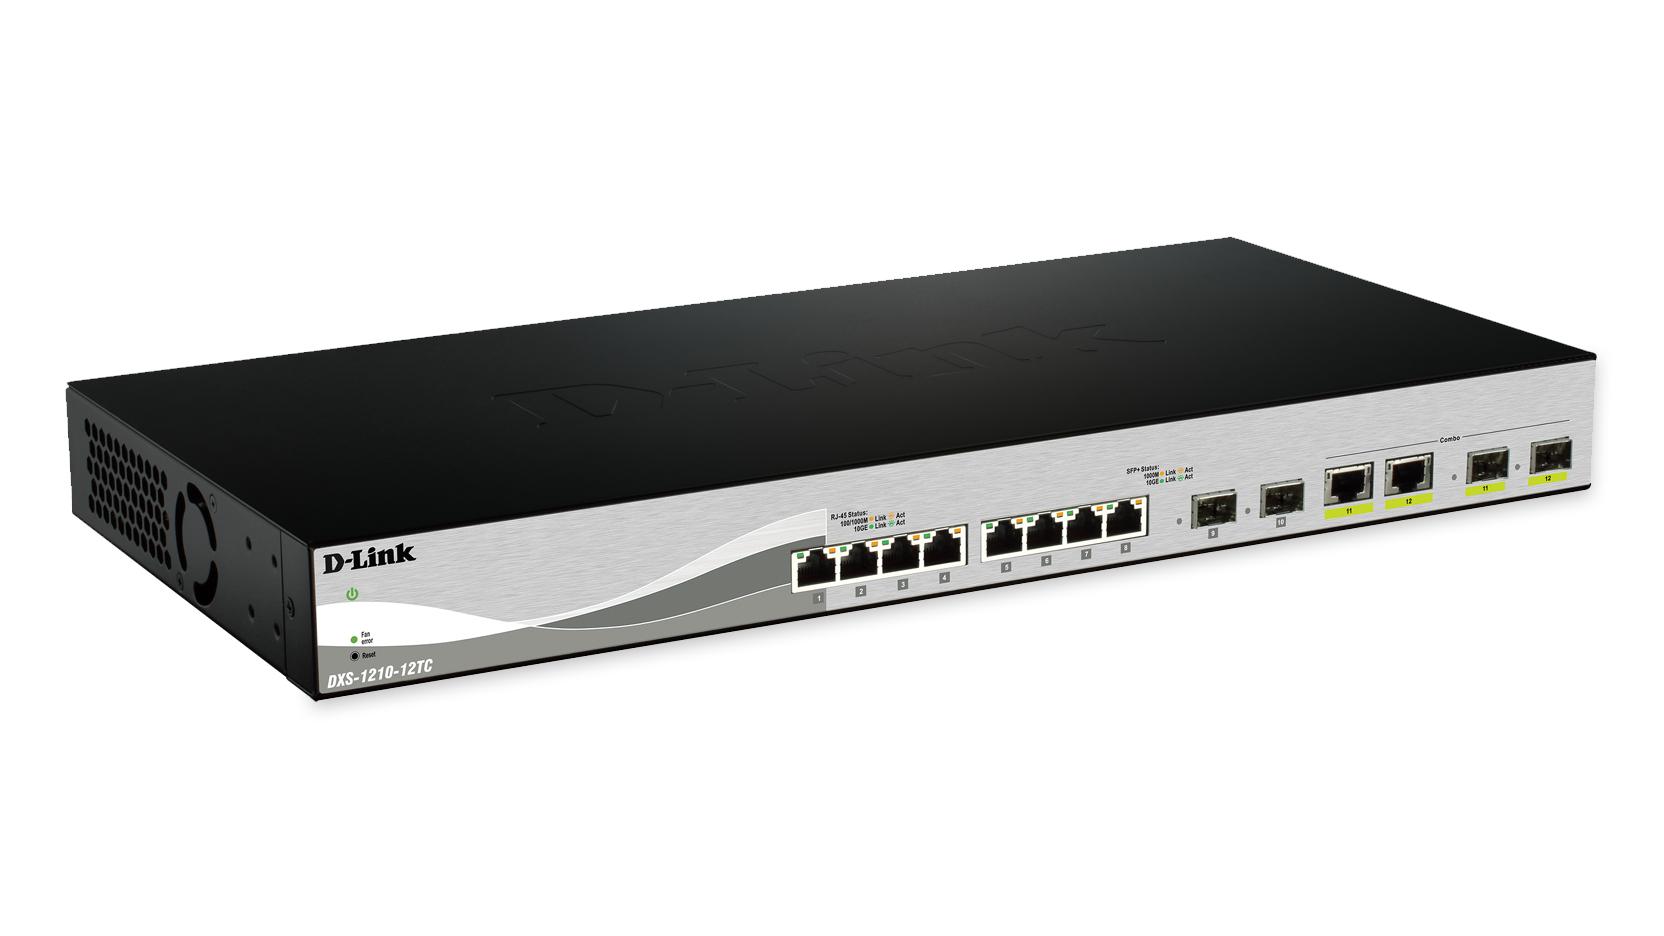 D-Link DXS-1210-12SC switch Gestionado L2 Negro, Plata 1U